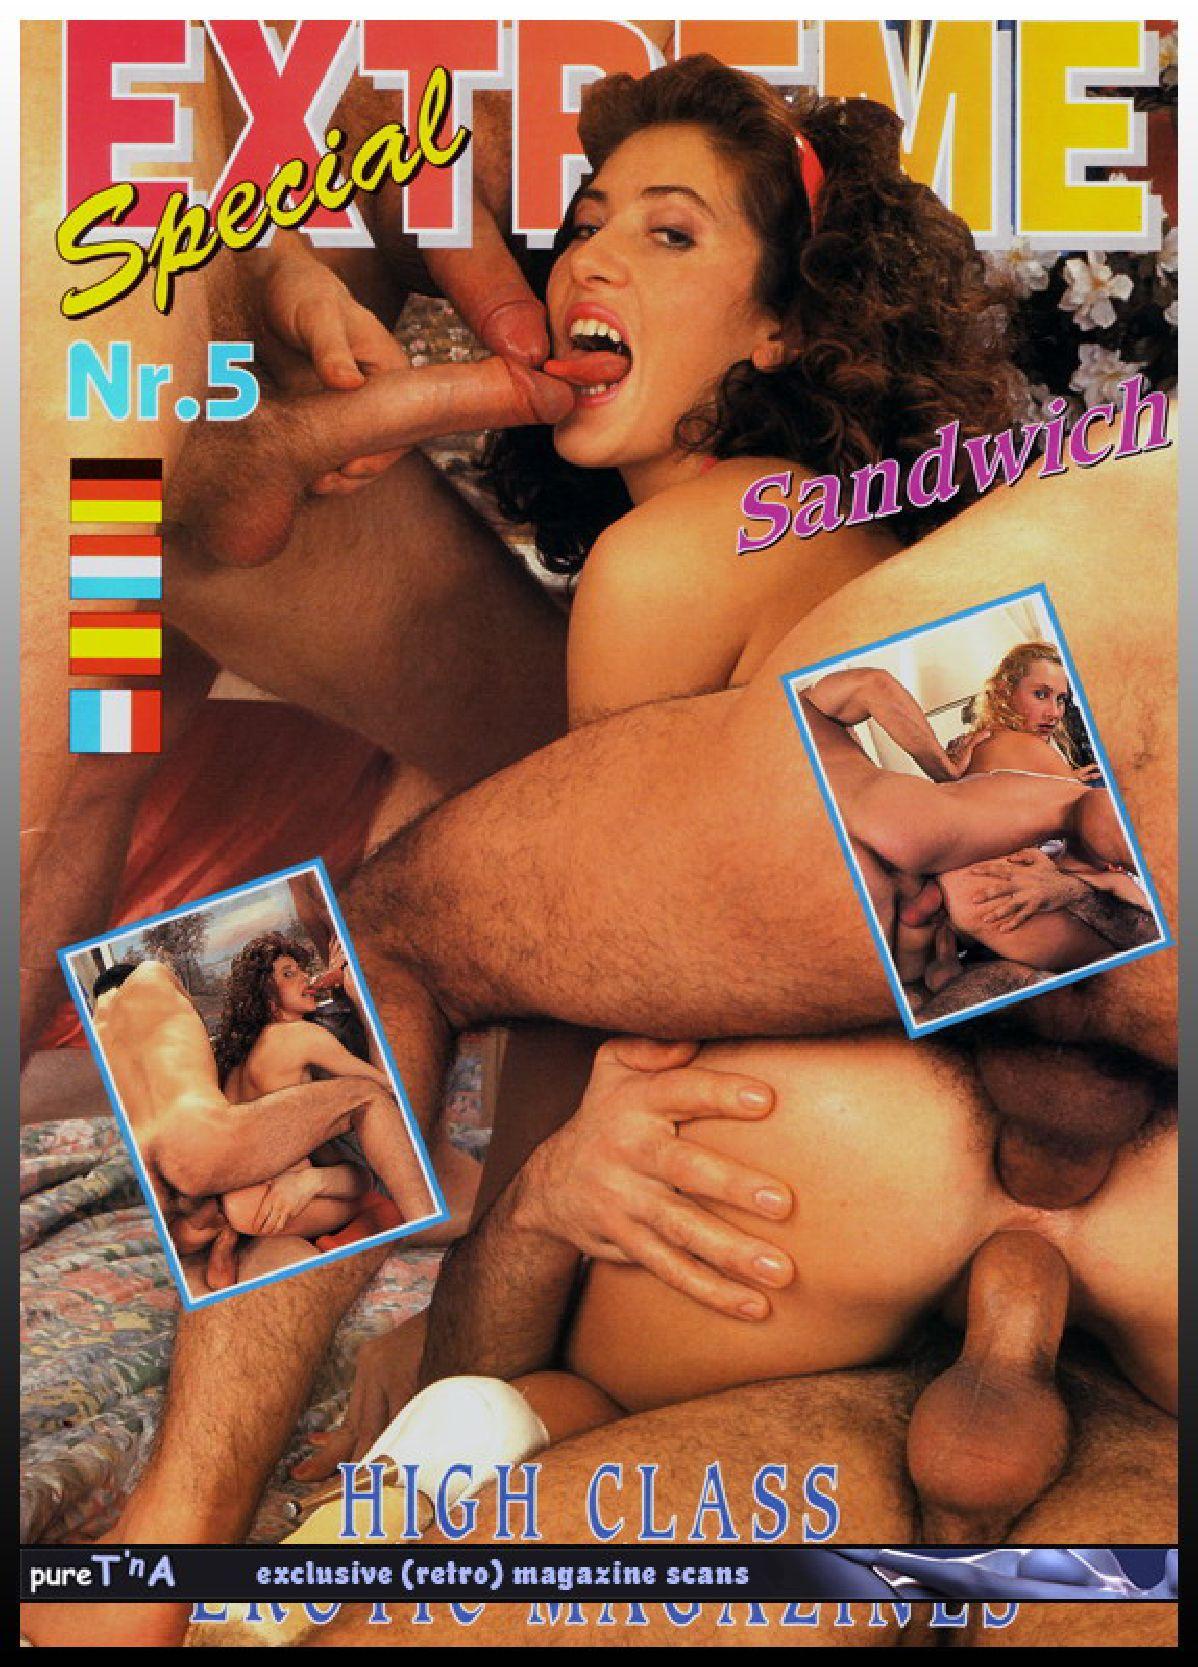 Adult porn magazine